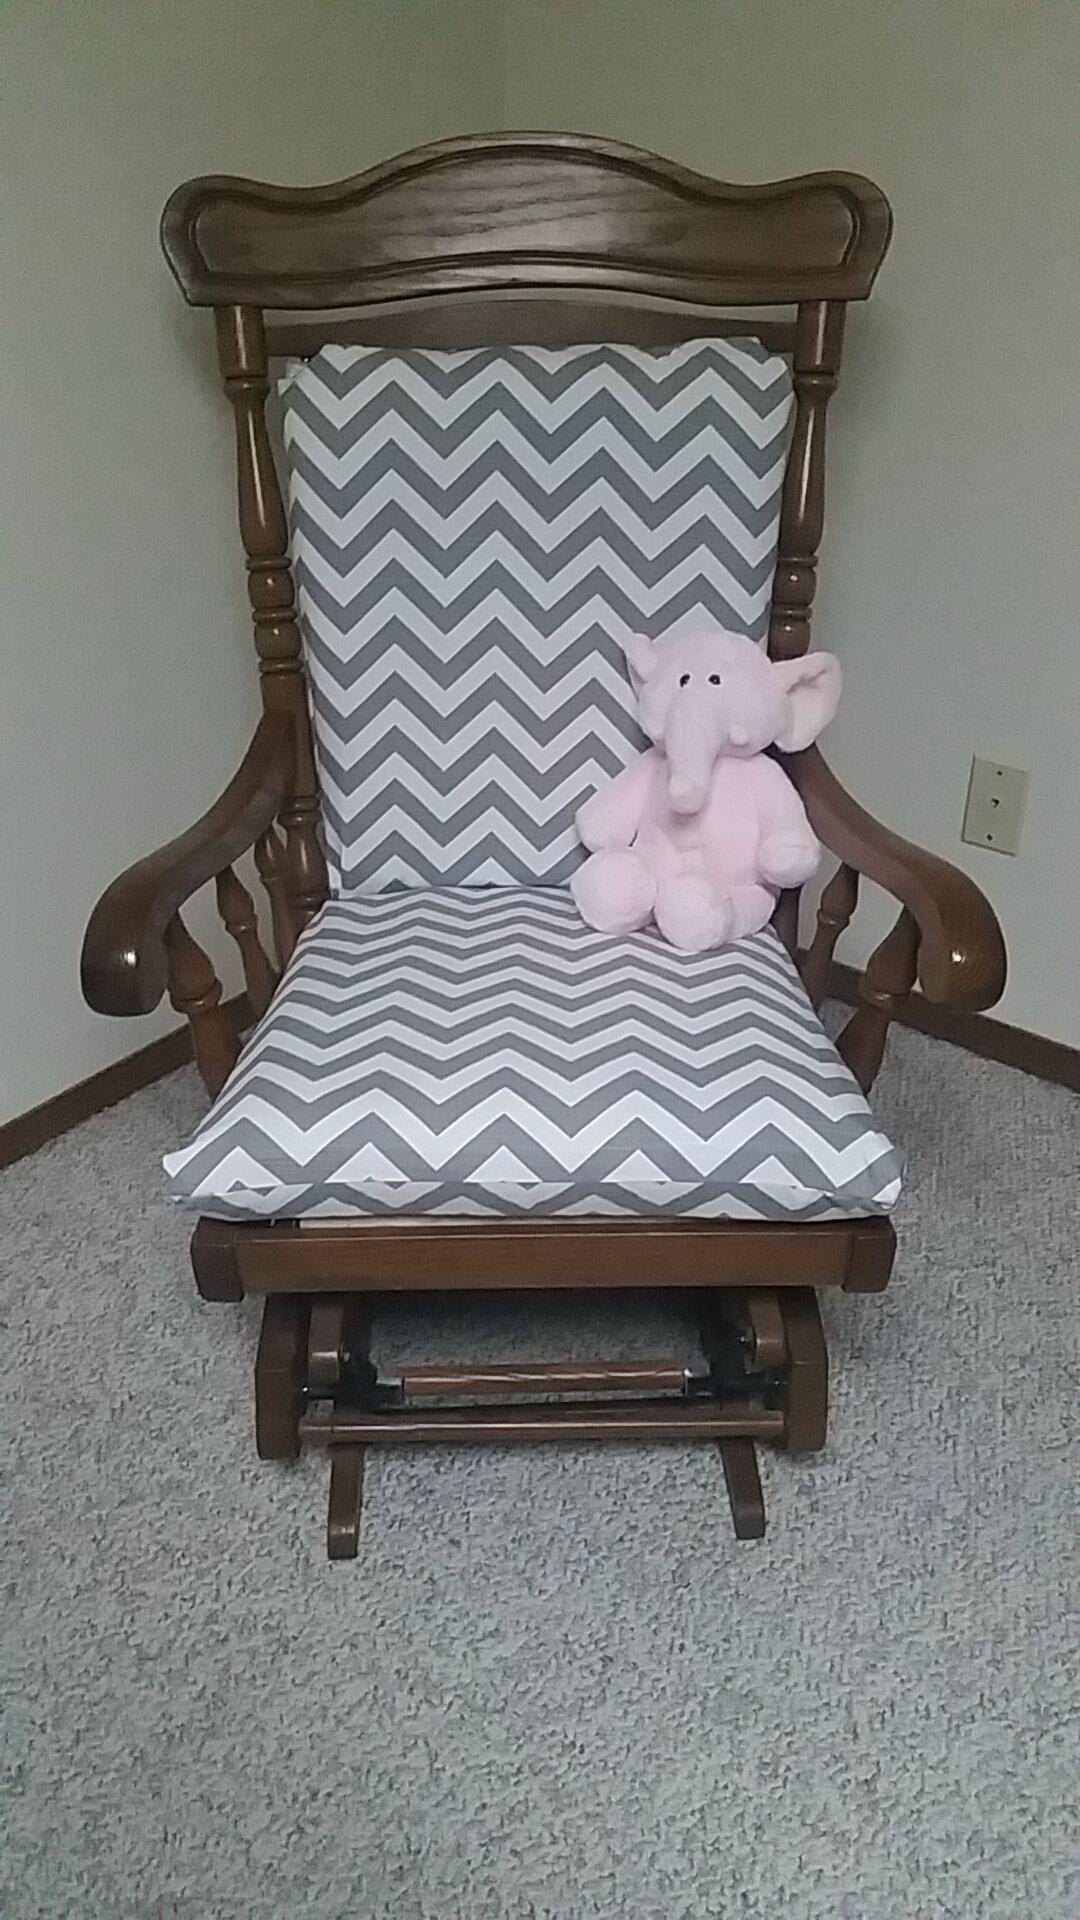 Old glider cushion reupholstered https://www.facebook.com/molliepopsboutique/